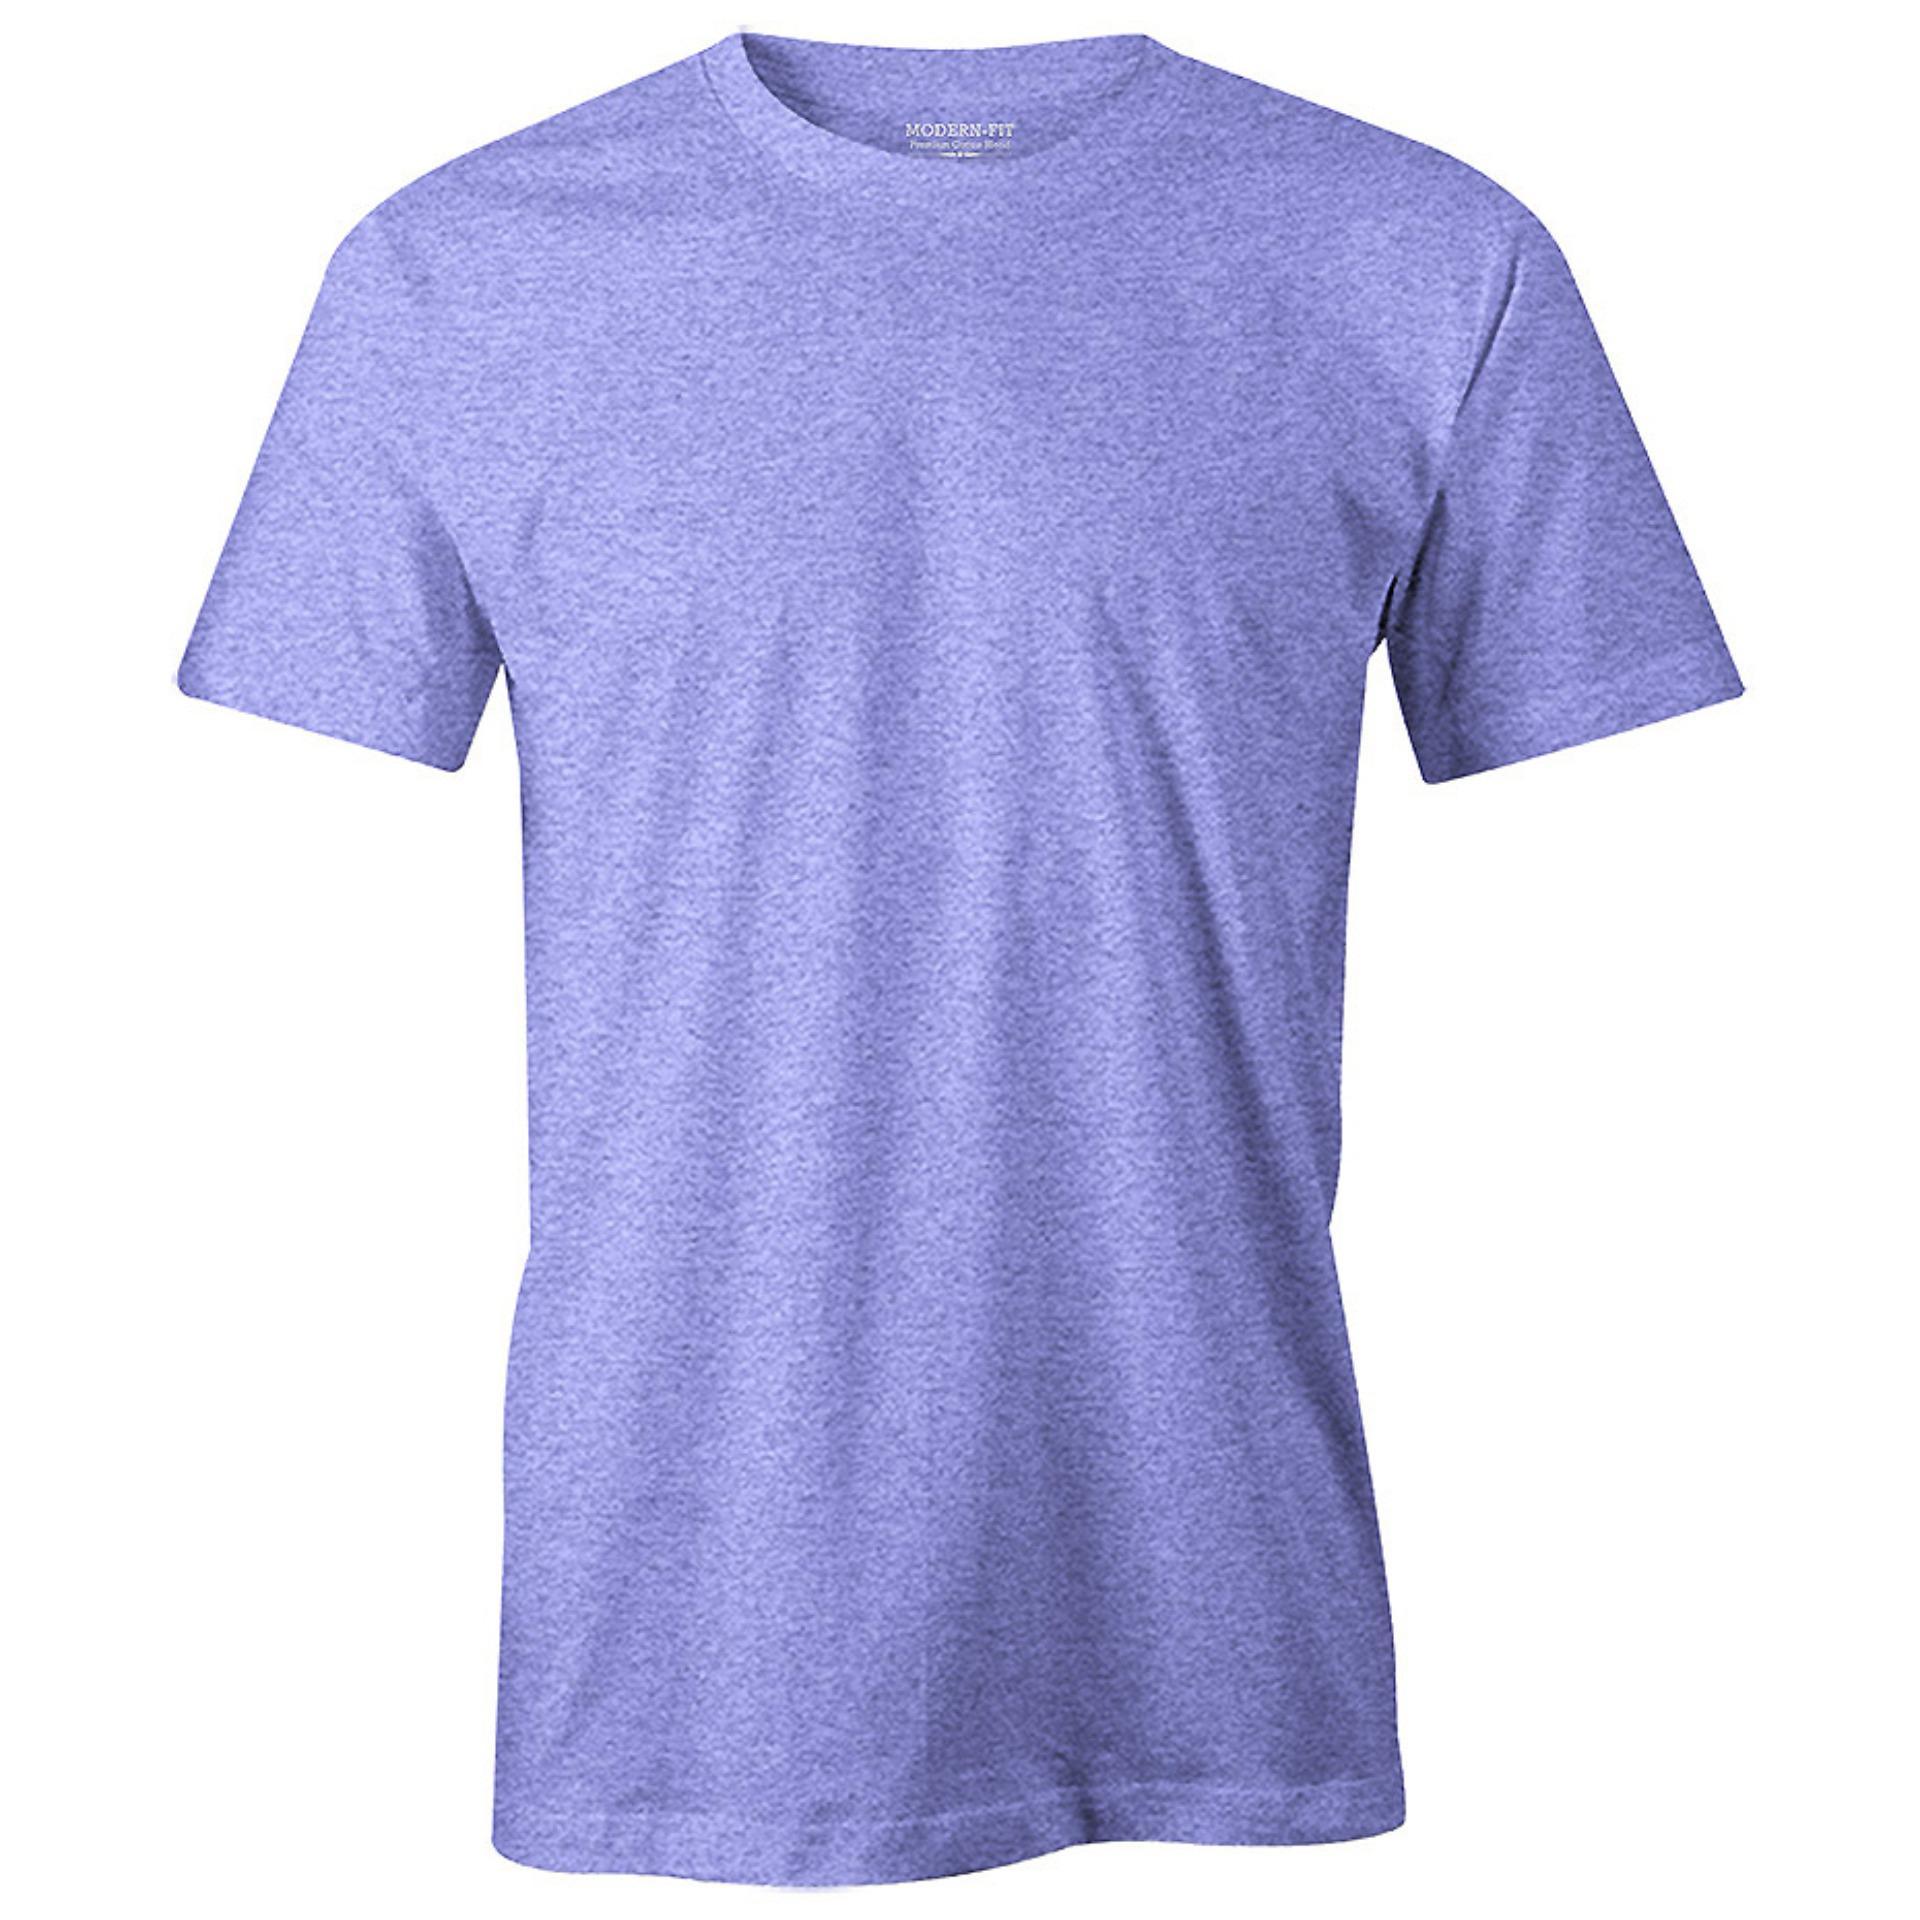 52898ff1 Indigo Marl - Mens Premium Crew Neck T-shirt